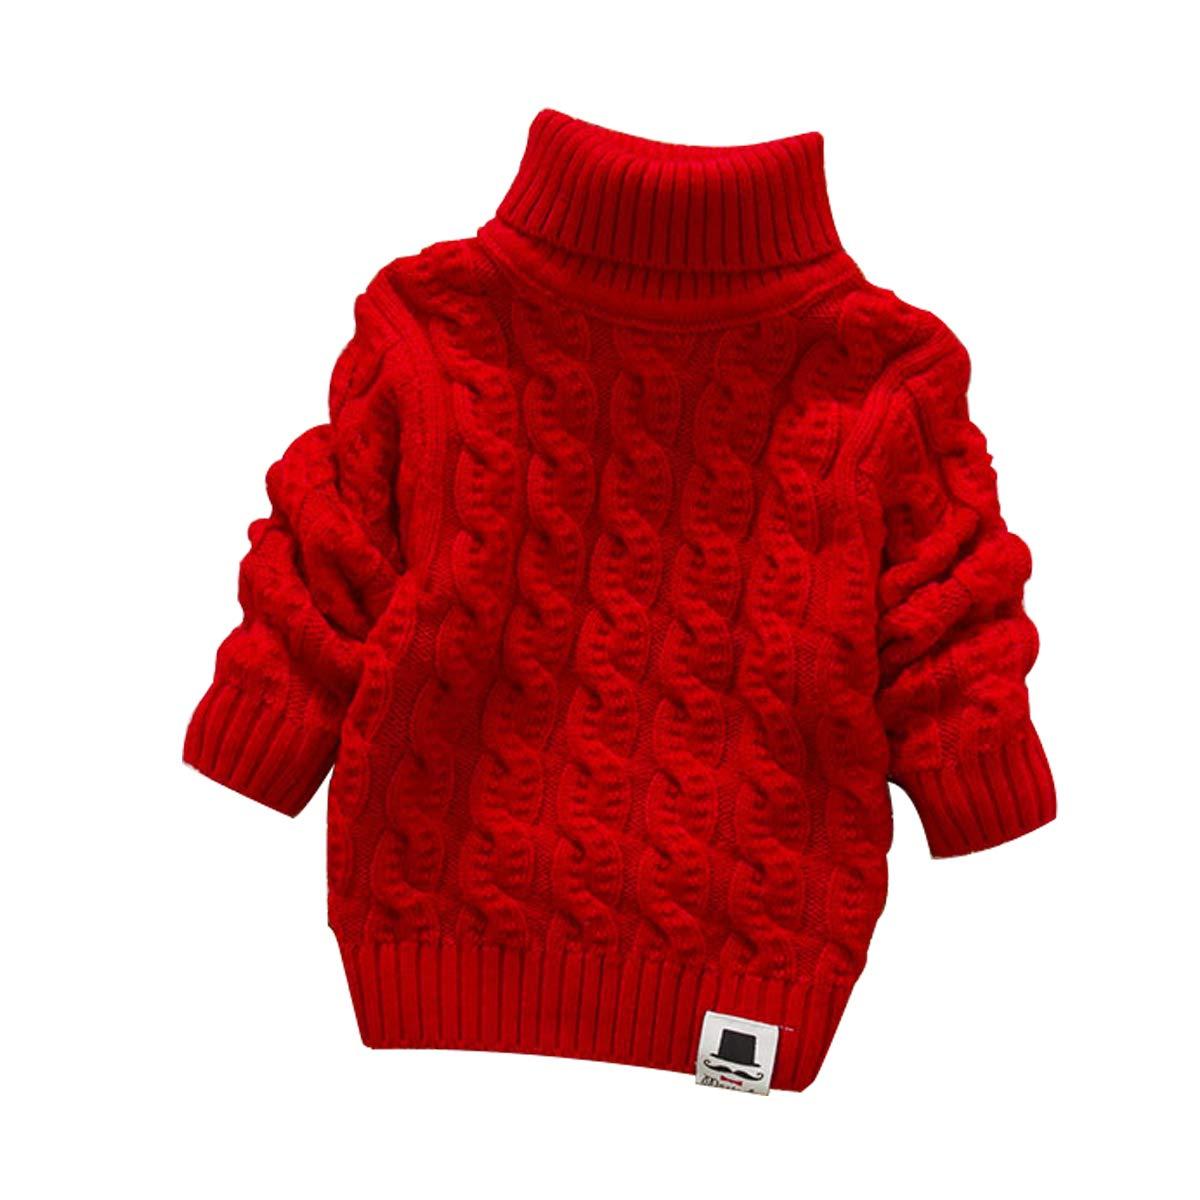 CuteOn Baby Boys Girls Solid Color Basic Turtleneck Cotton Bodysuit Jumpsuit Light Yellow 12 Months